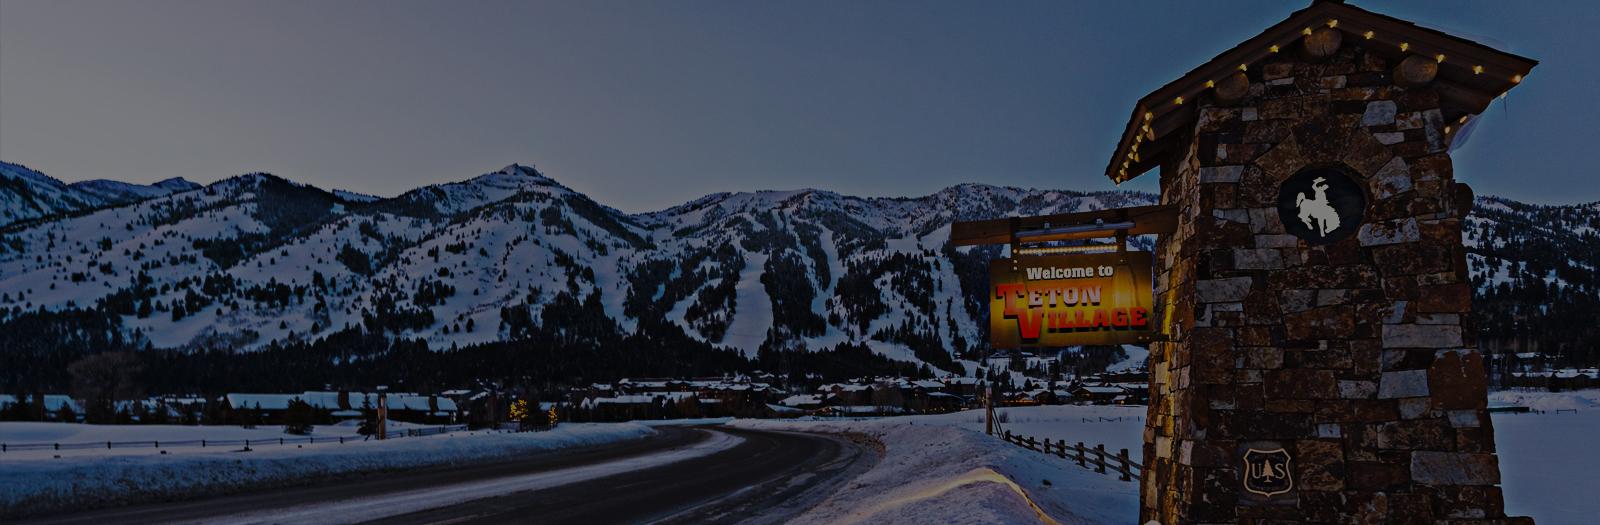 medical professional giveaway, ski trip giveaway